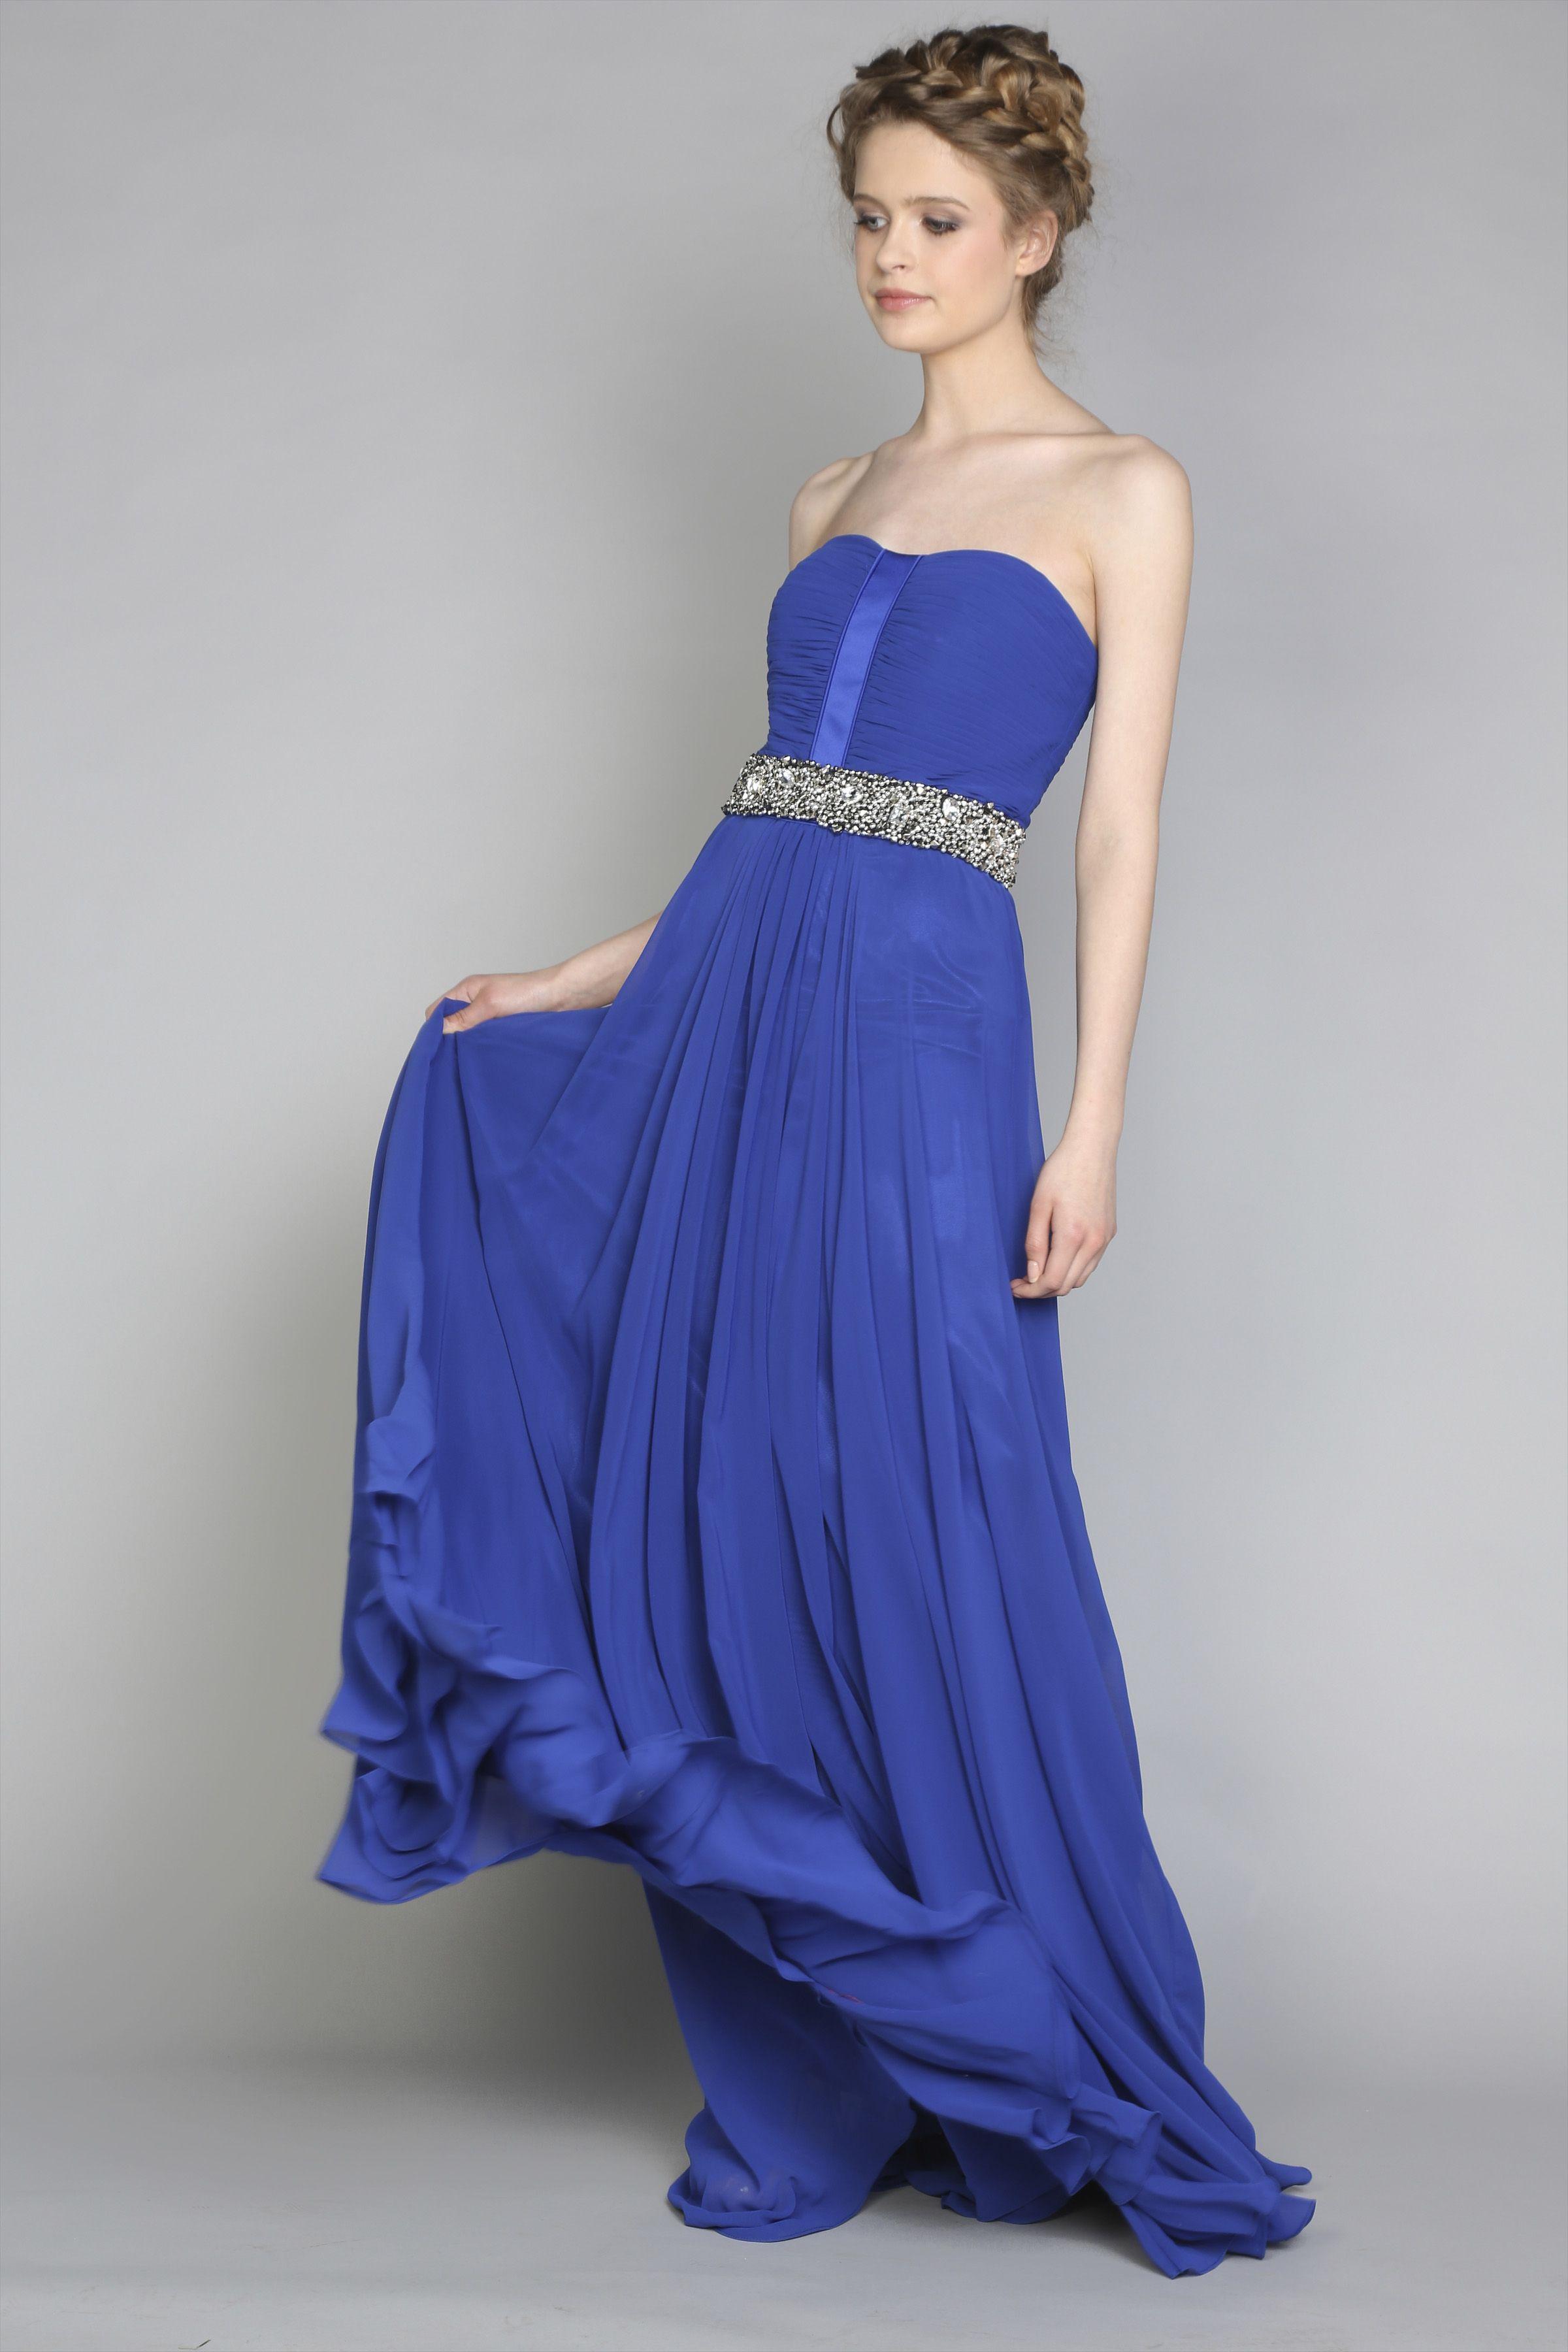 d810509e014 Royal blue debs dress